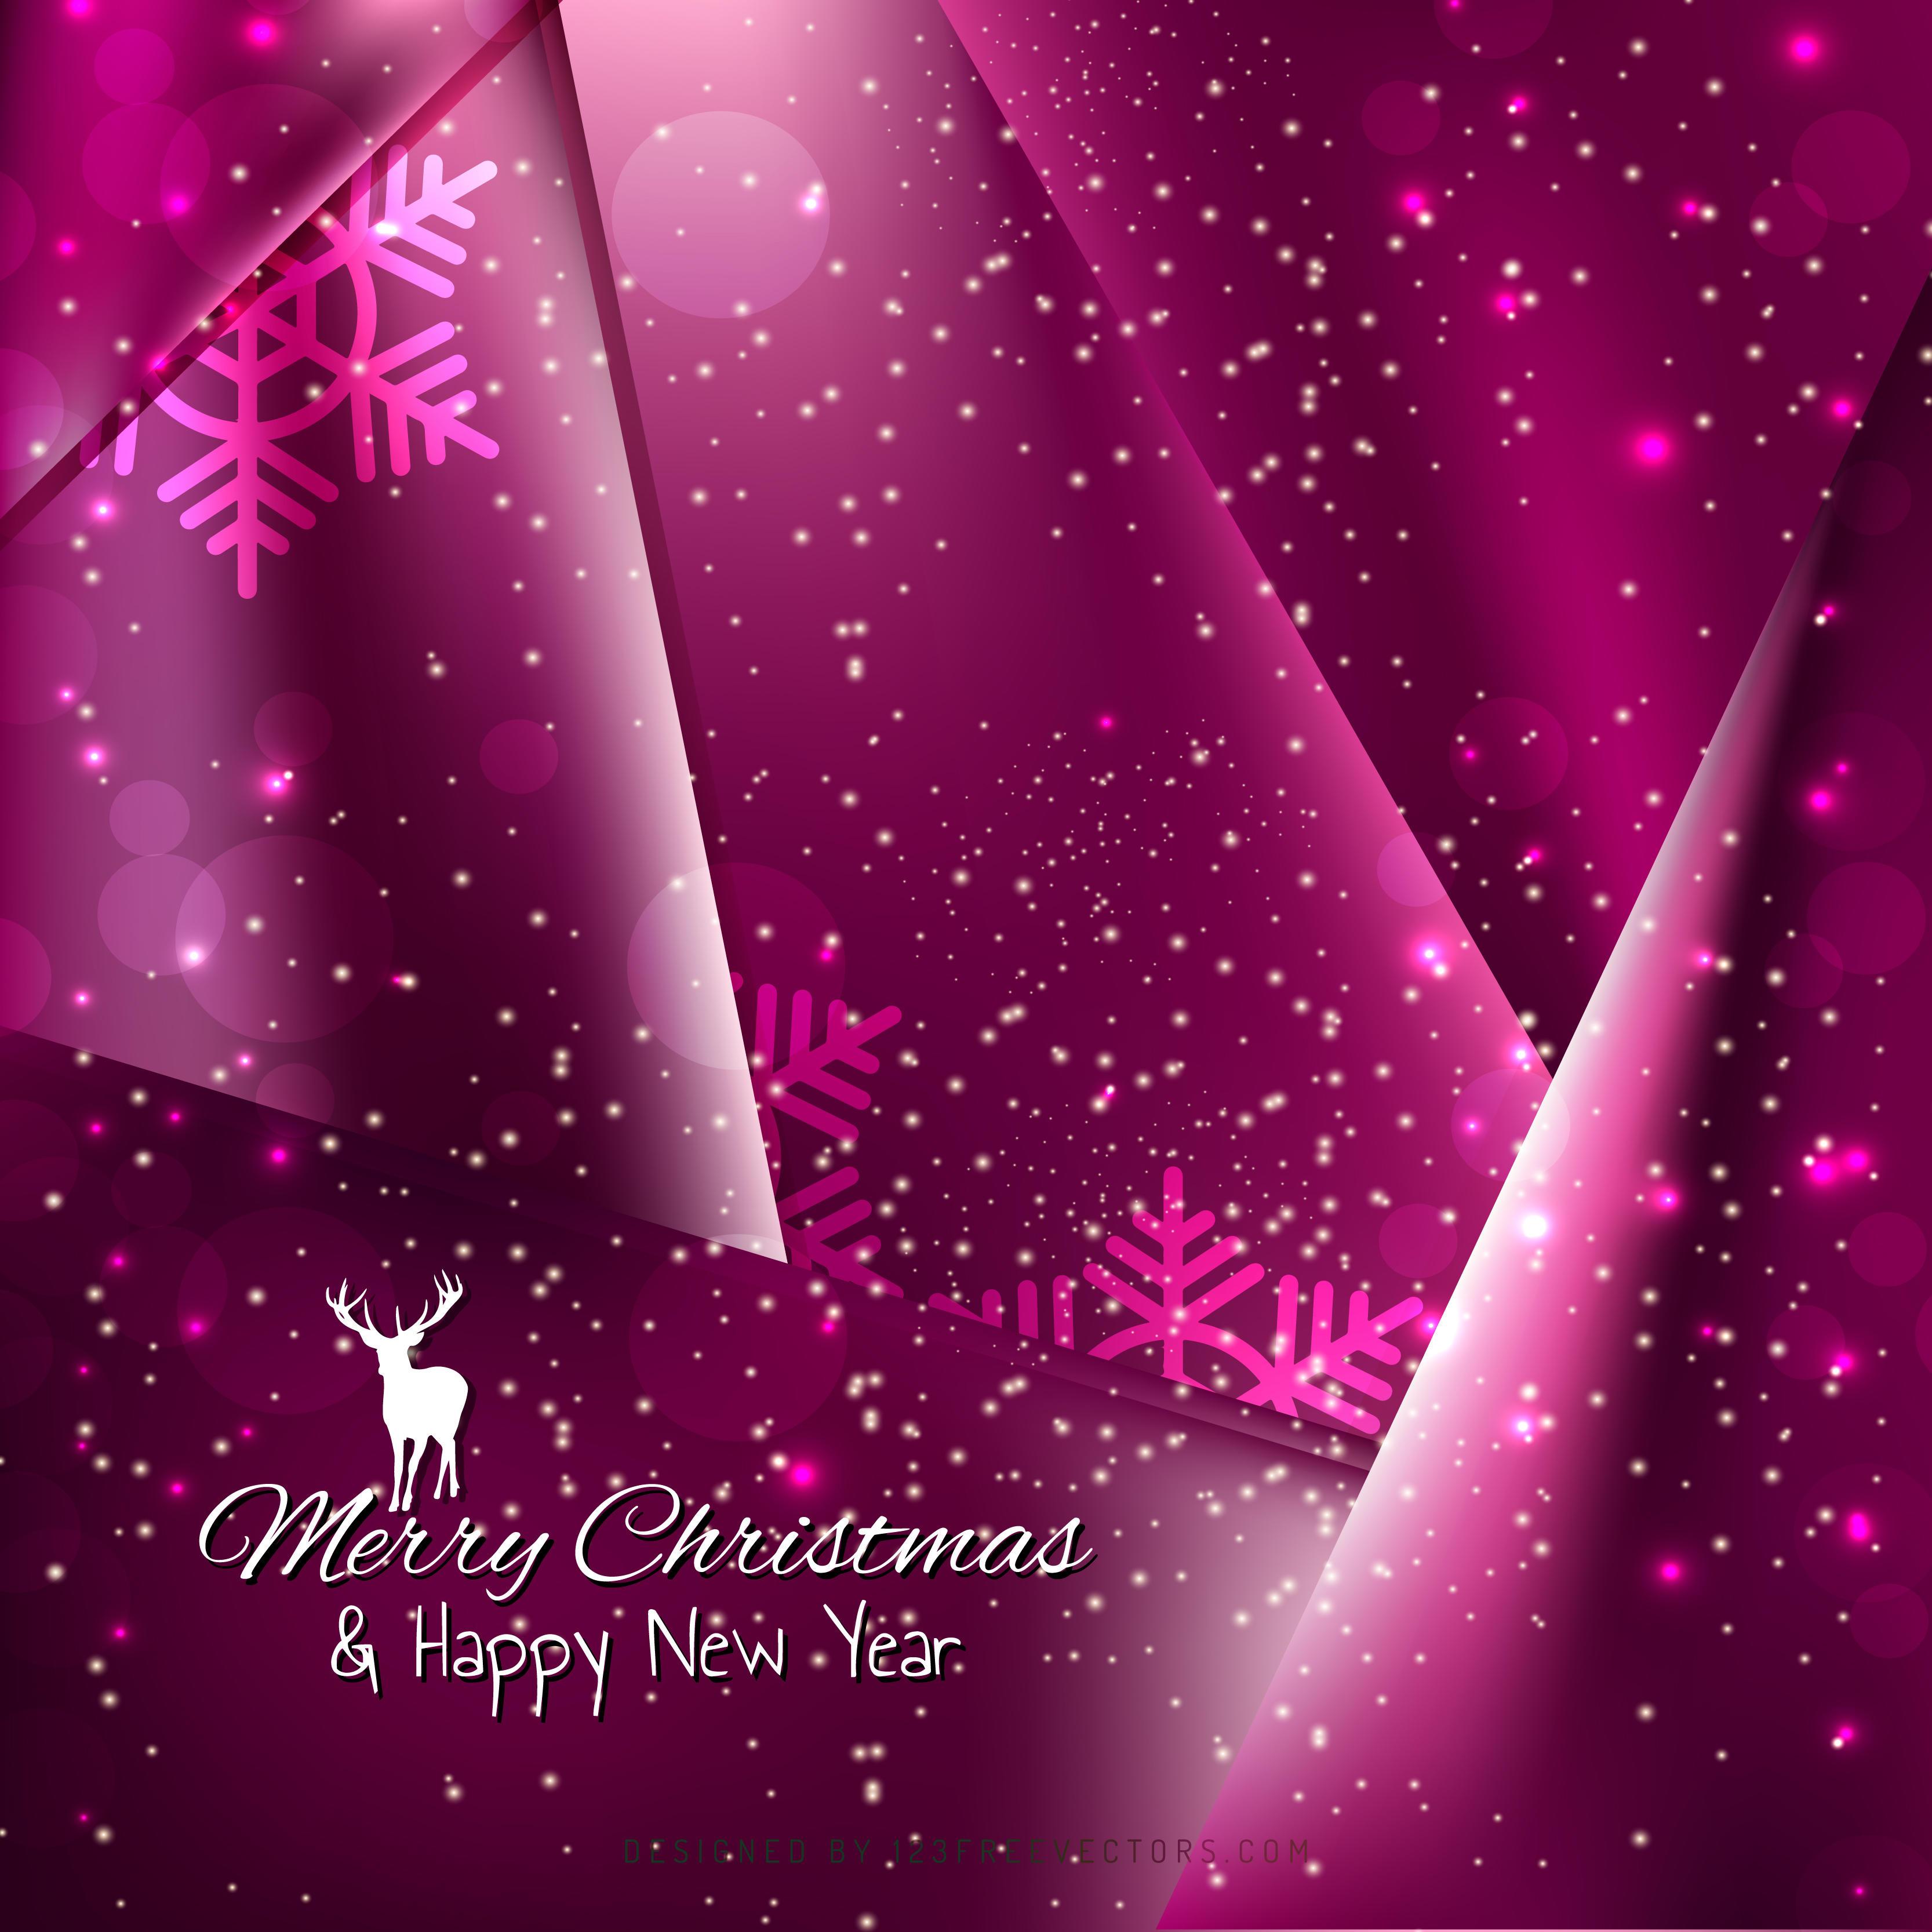 tyrian purple christmas balls background design 123freevectors